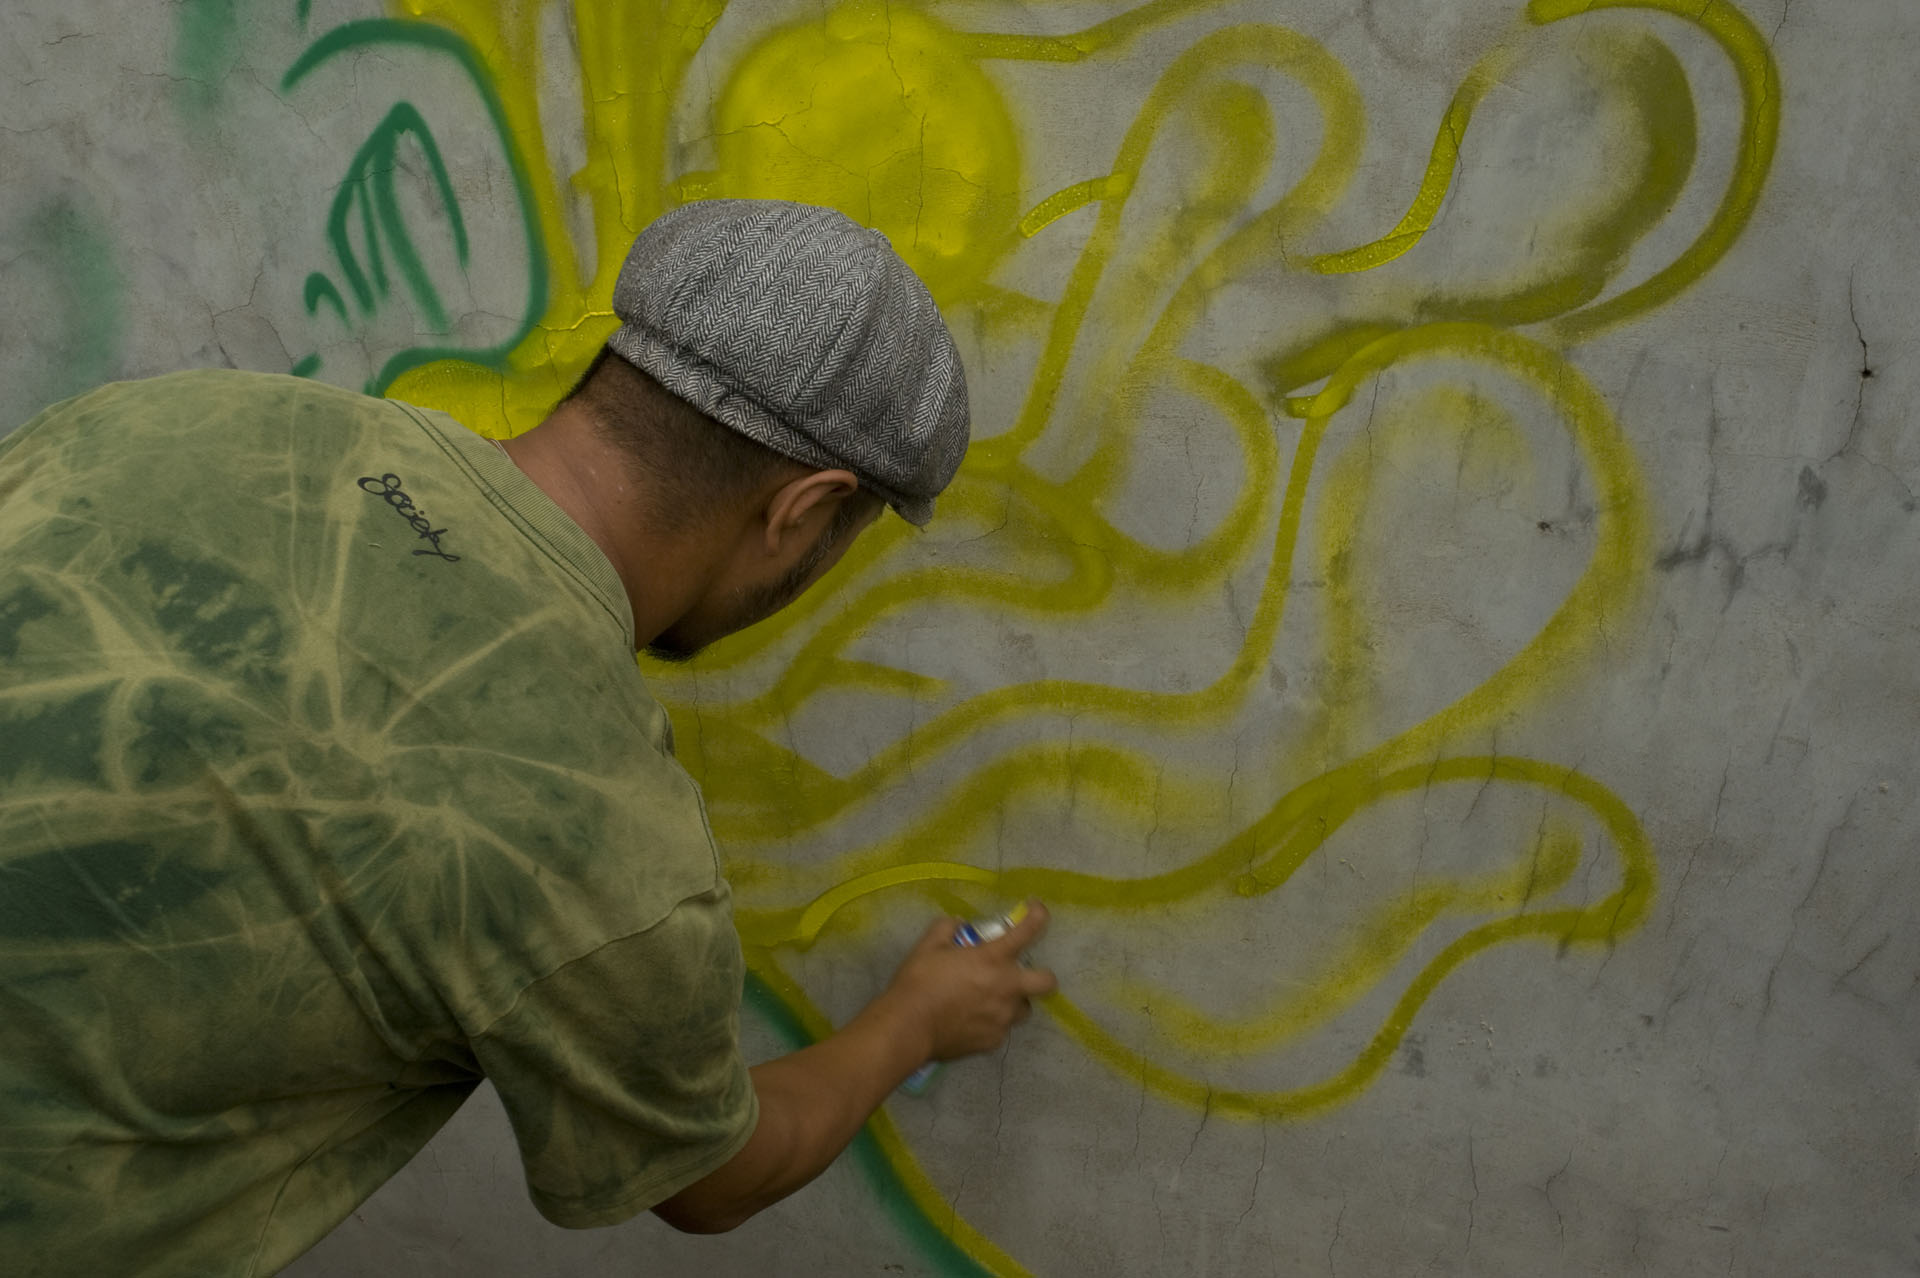 Street culture made in Beijing